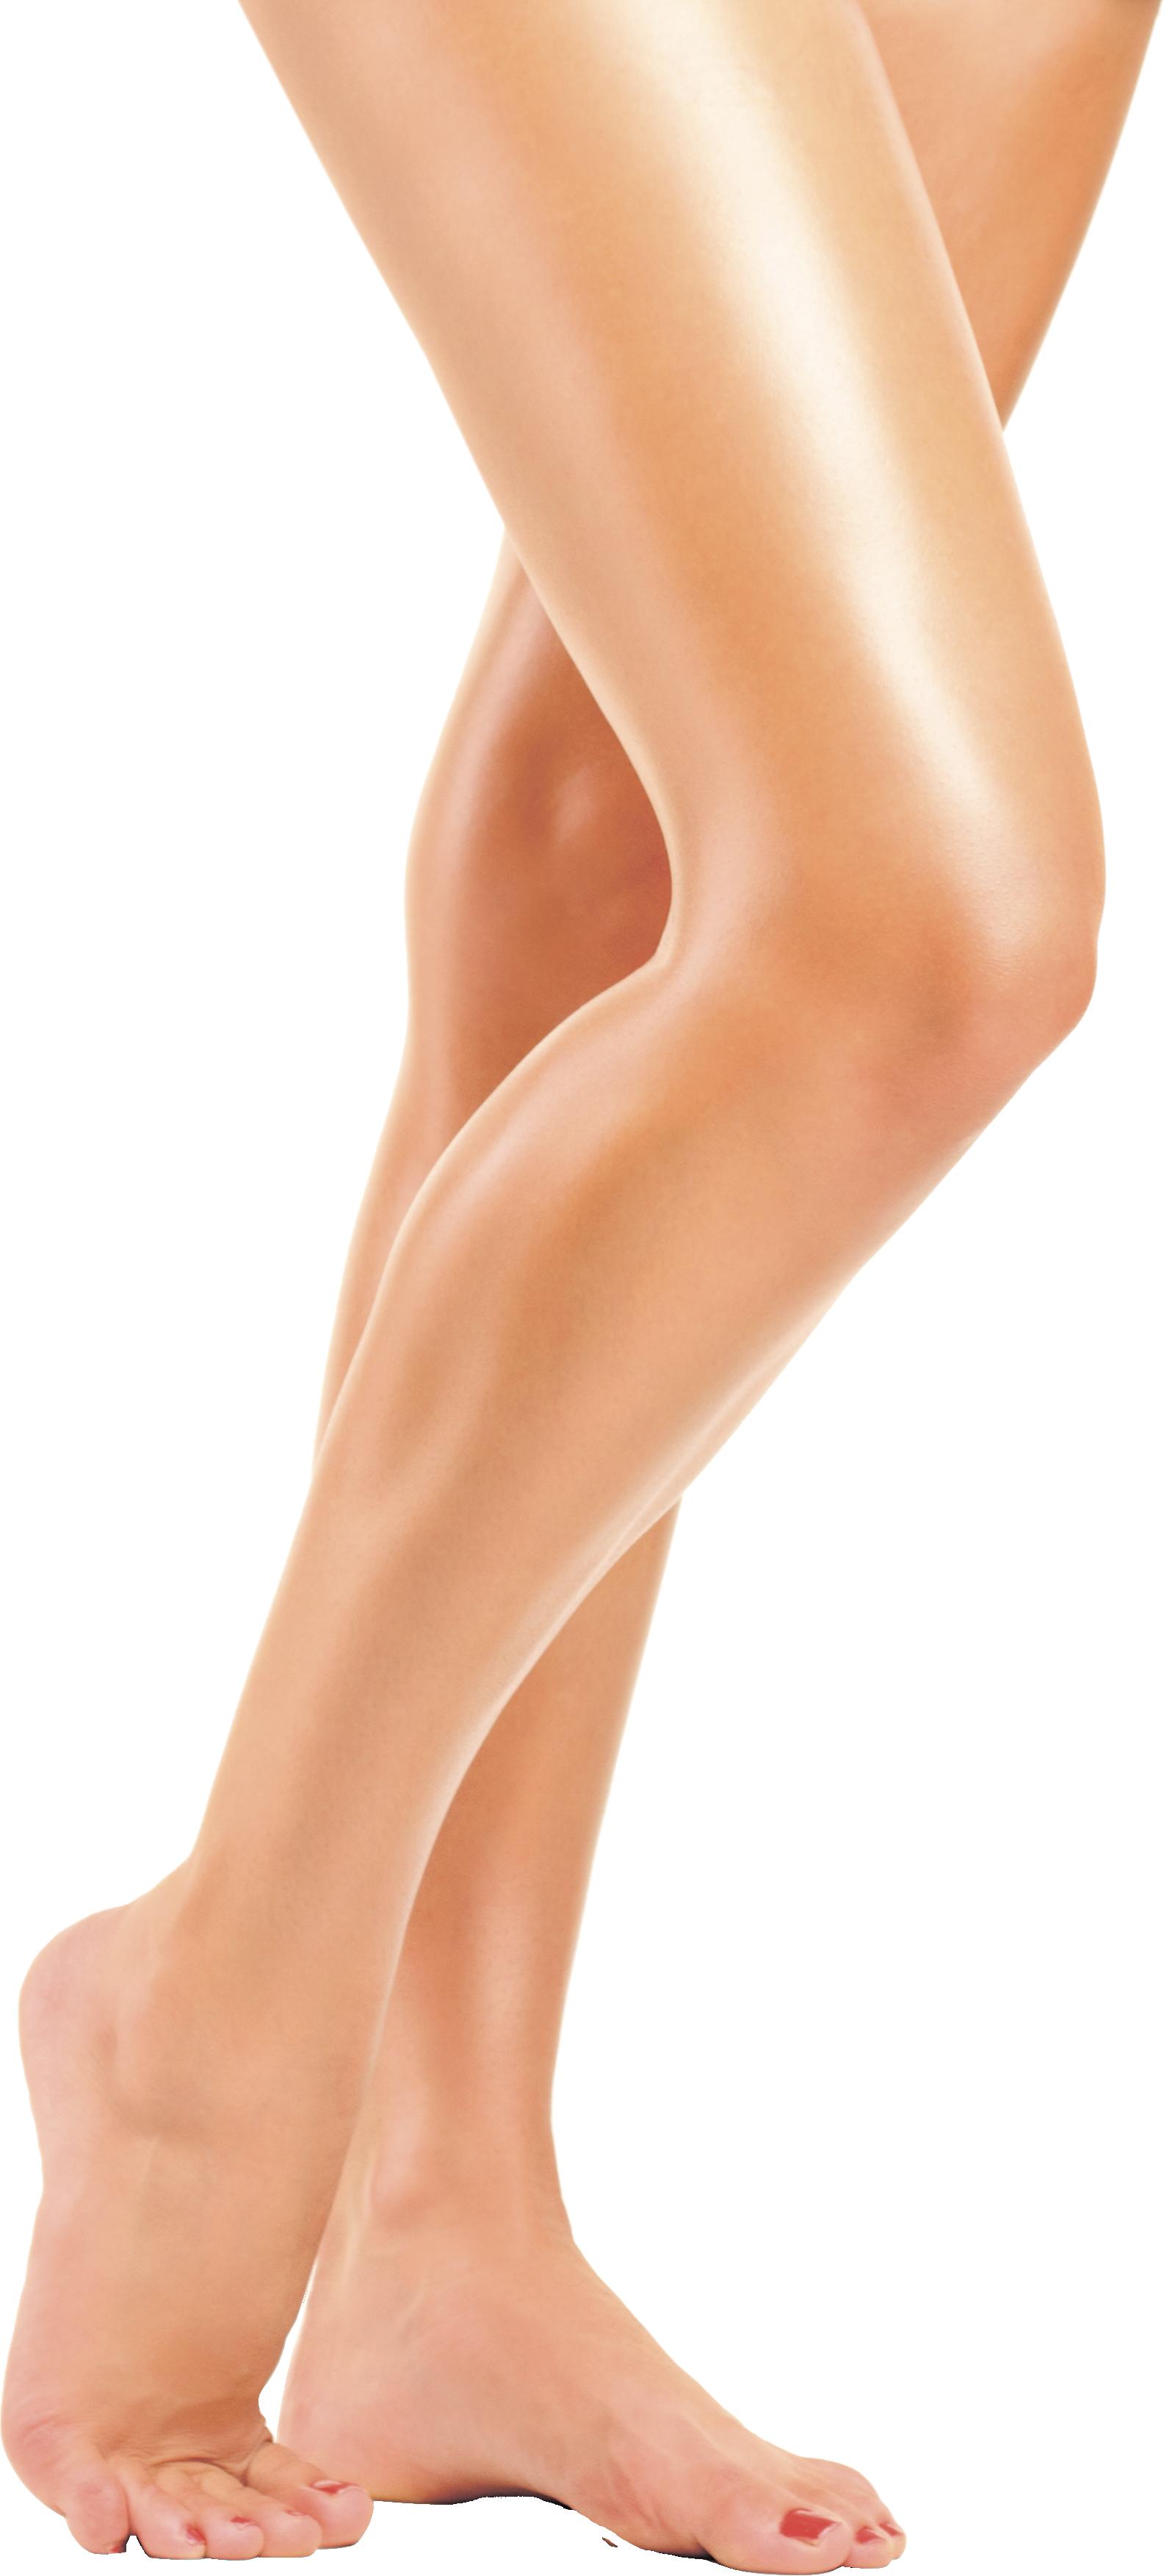 Women legs PNG image - Leg PNG